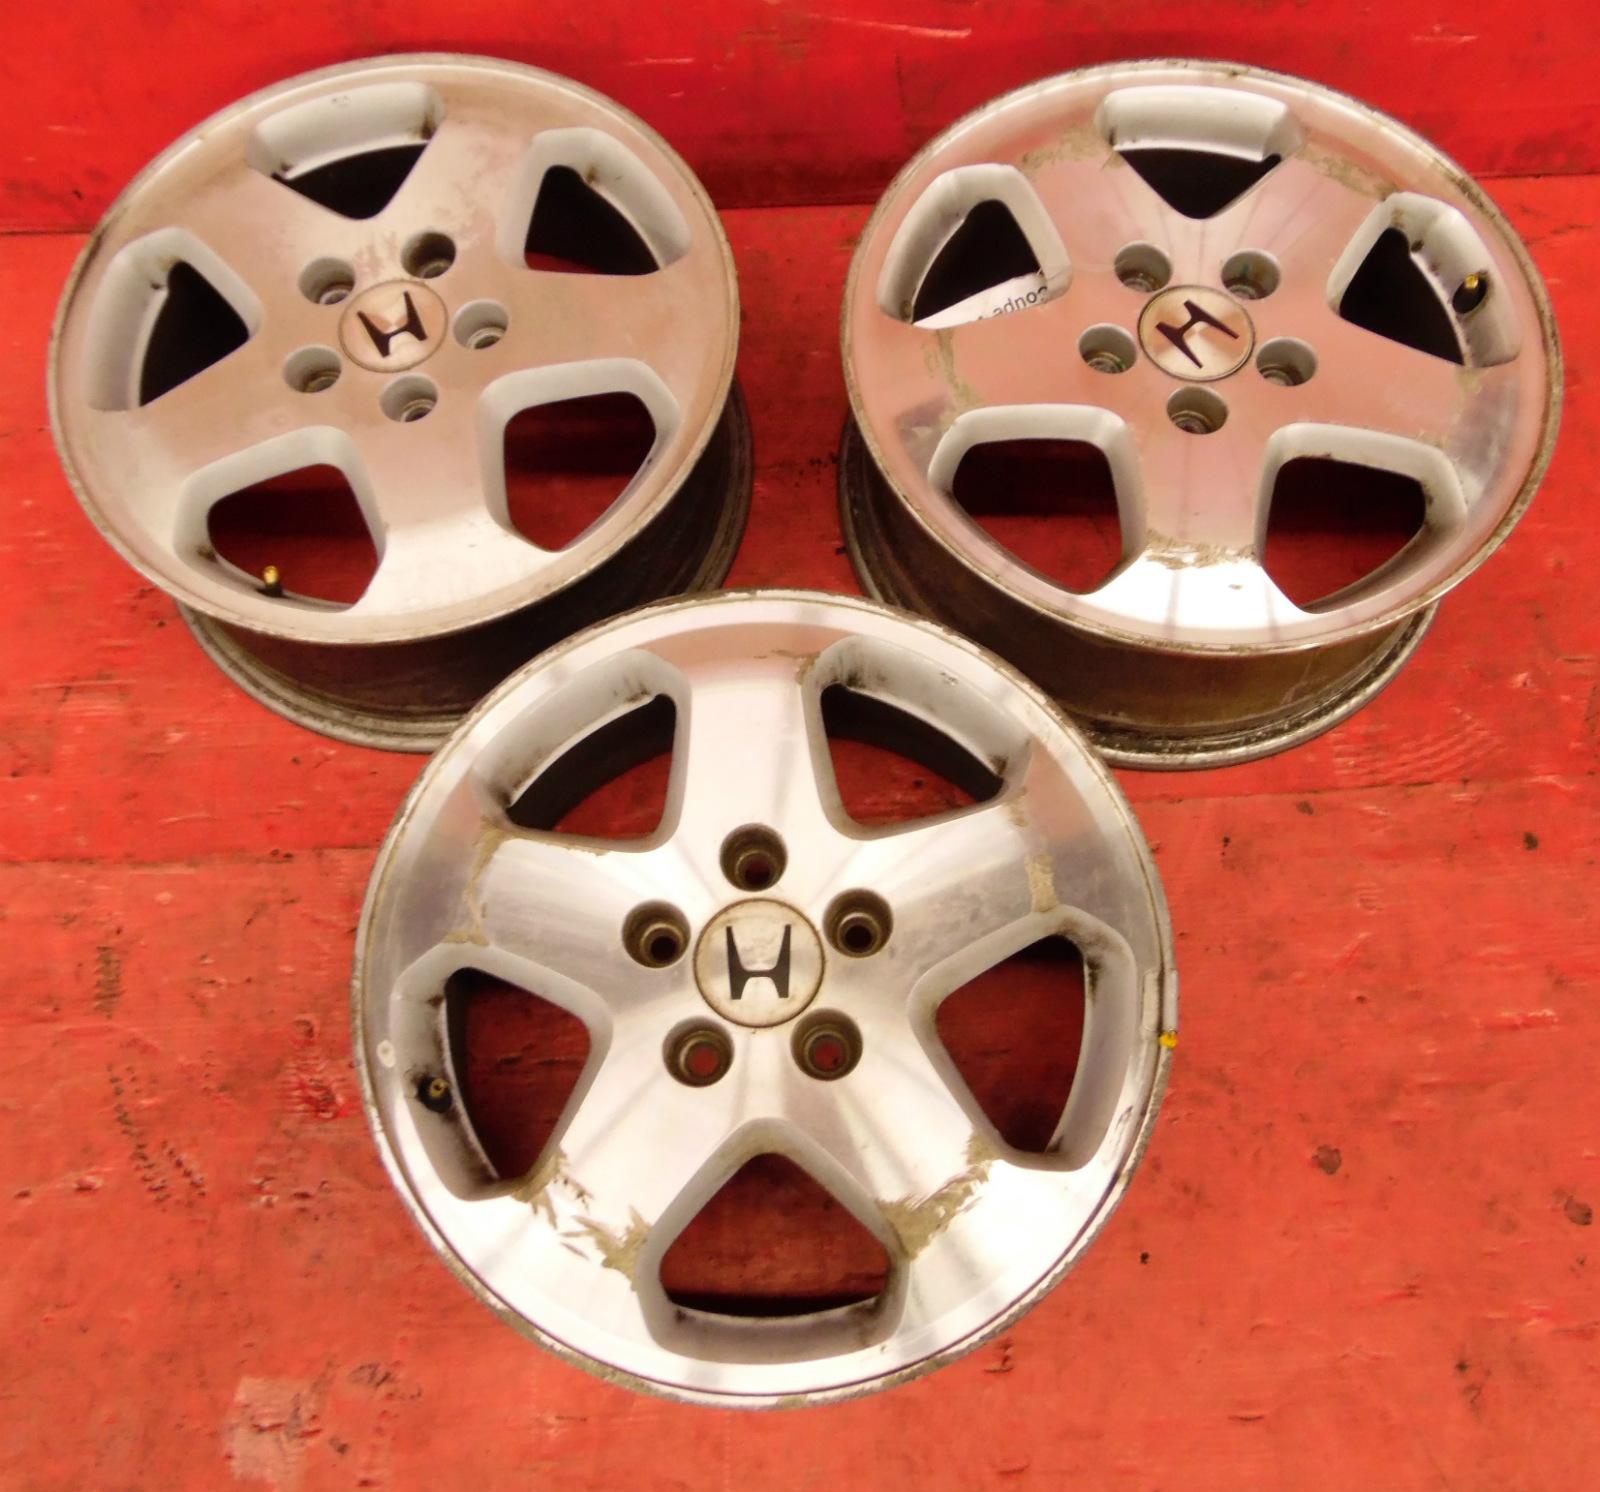 "98-02 Honda Accord OEM 5 spoke 16"" wheels rims STOCK factory 6 cyl 5 lug x3  only"